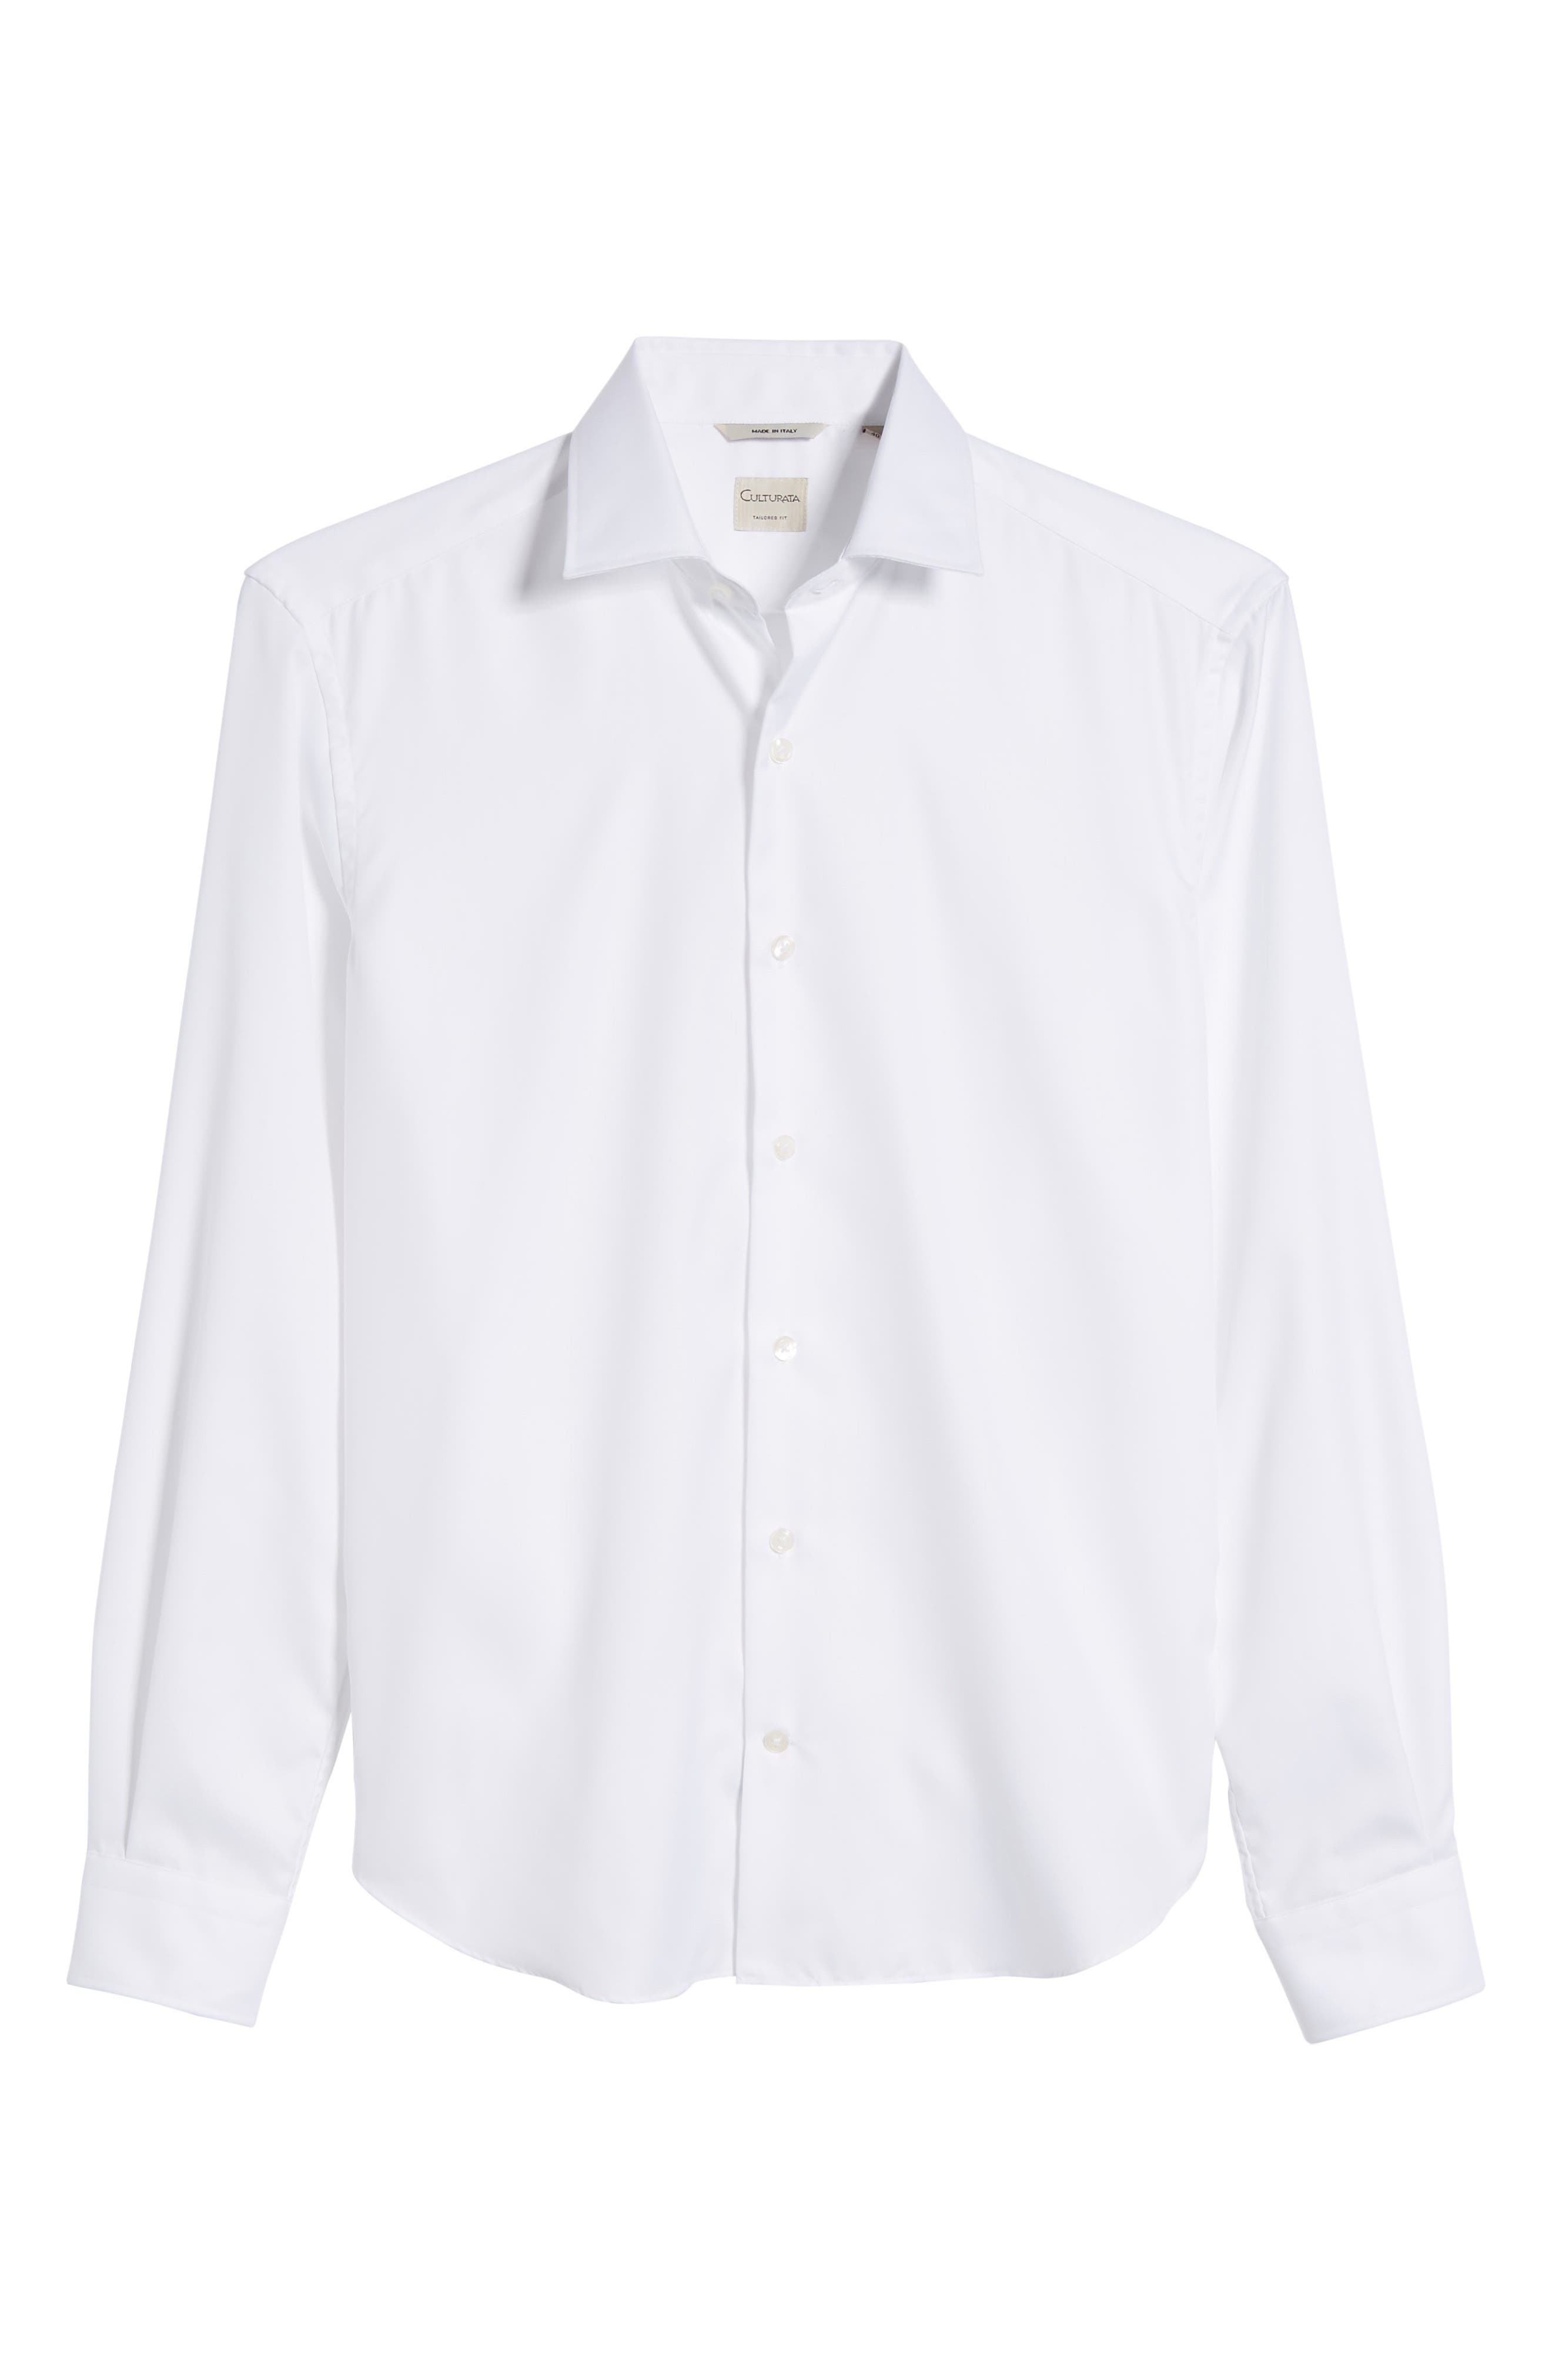 Crease Free Extra Soft Sport Shirt,                             Alternate thumbnail 6, color,                             100